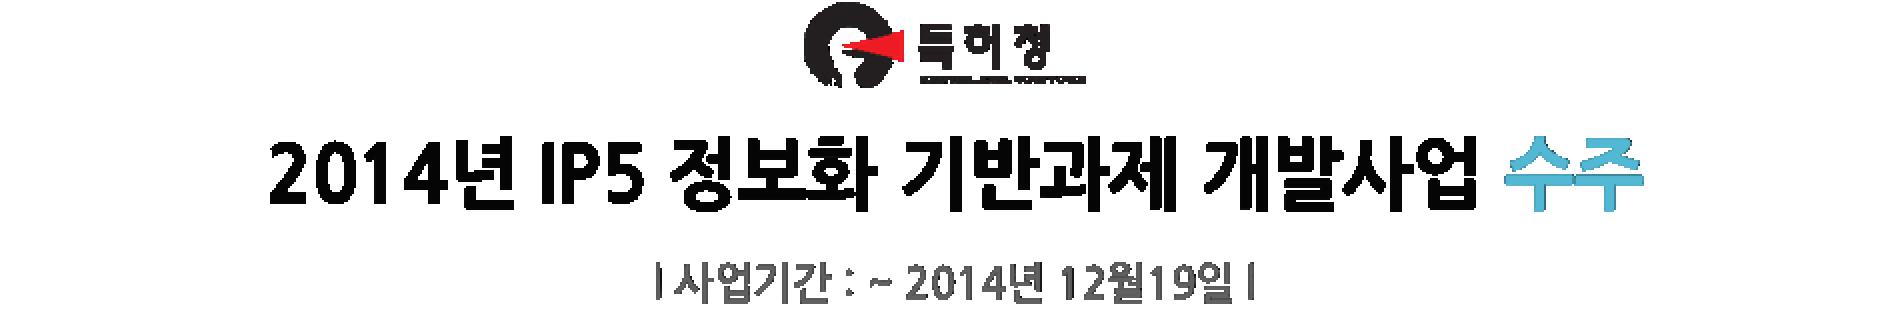 IP5 정보화 사업-01.png